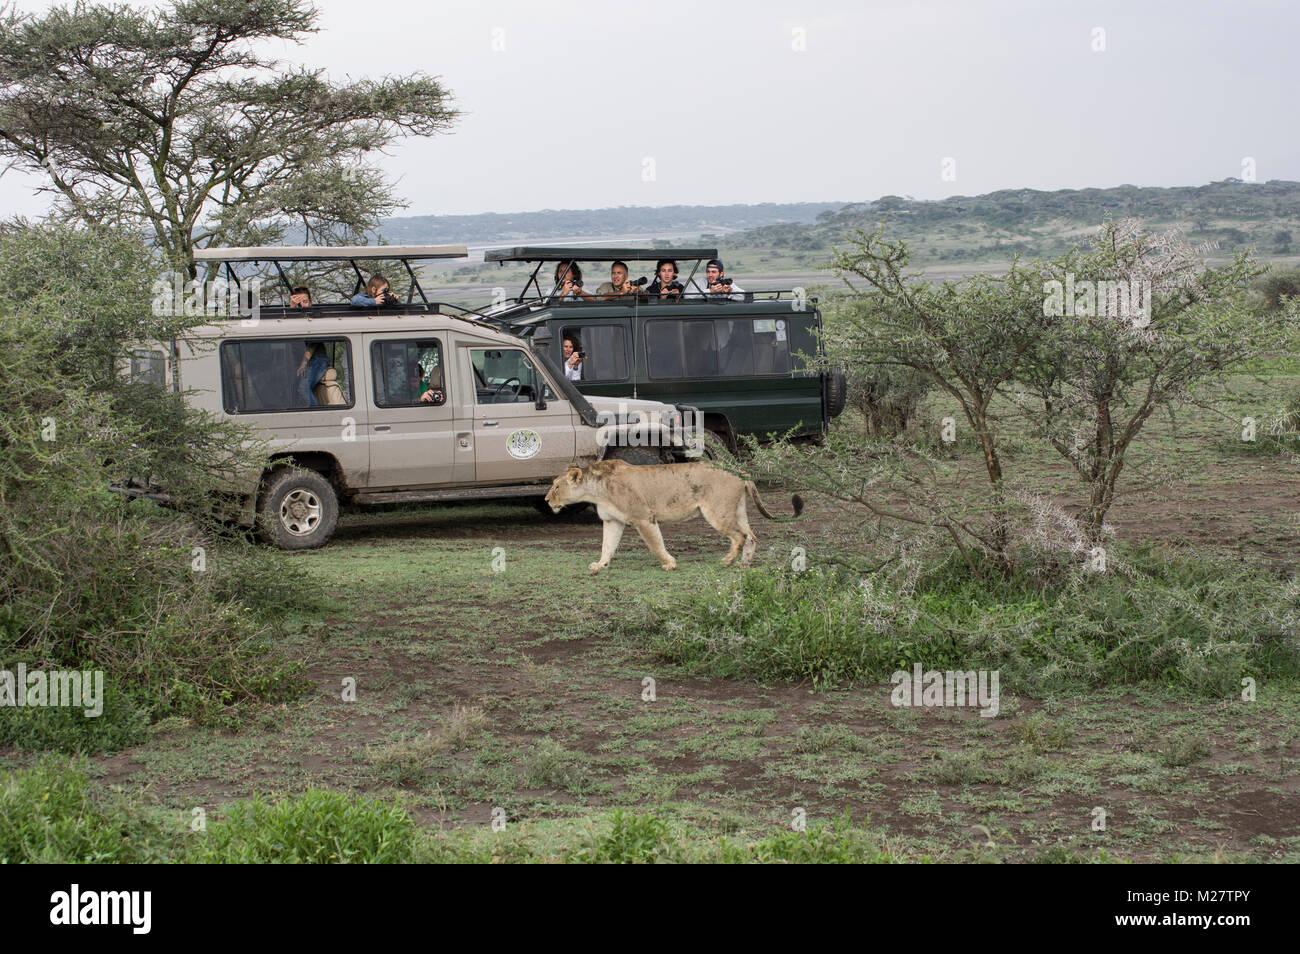 Female lioness in the Serengeti walking near safari SUV vehicles - Stock Image